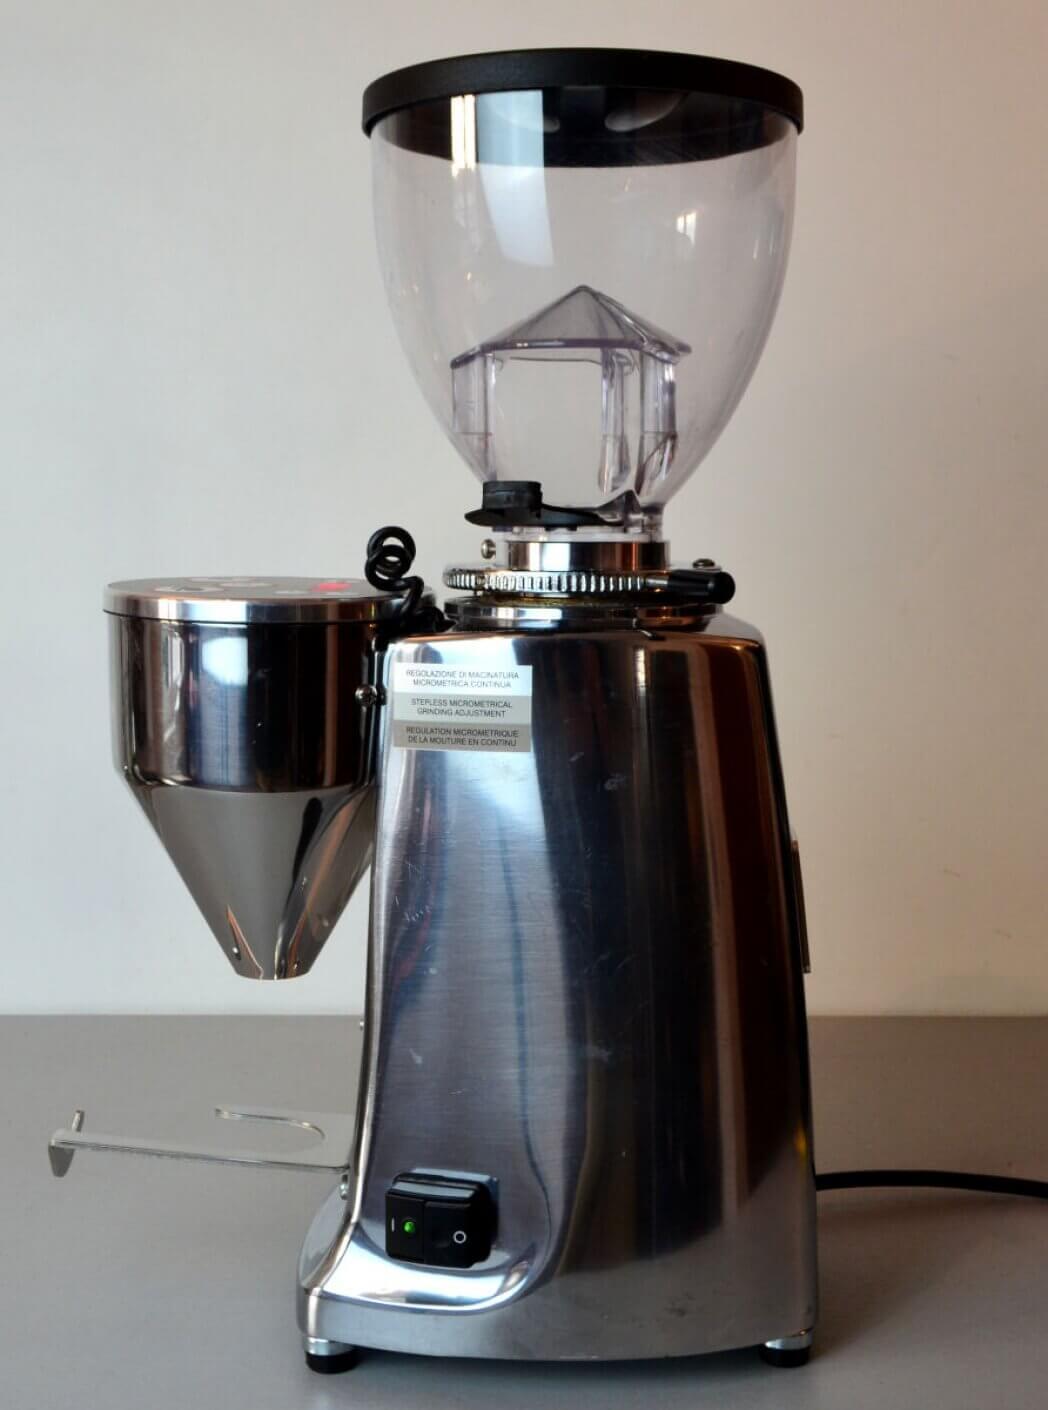 mazzer mini electronique a moulin a cafe  7